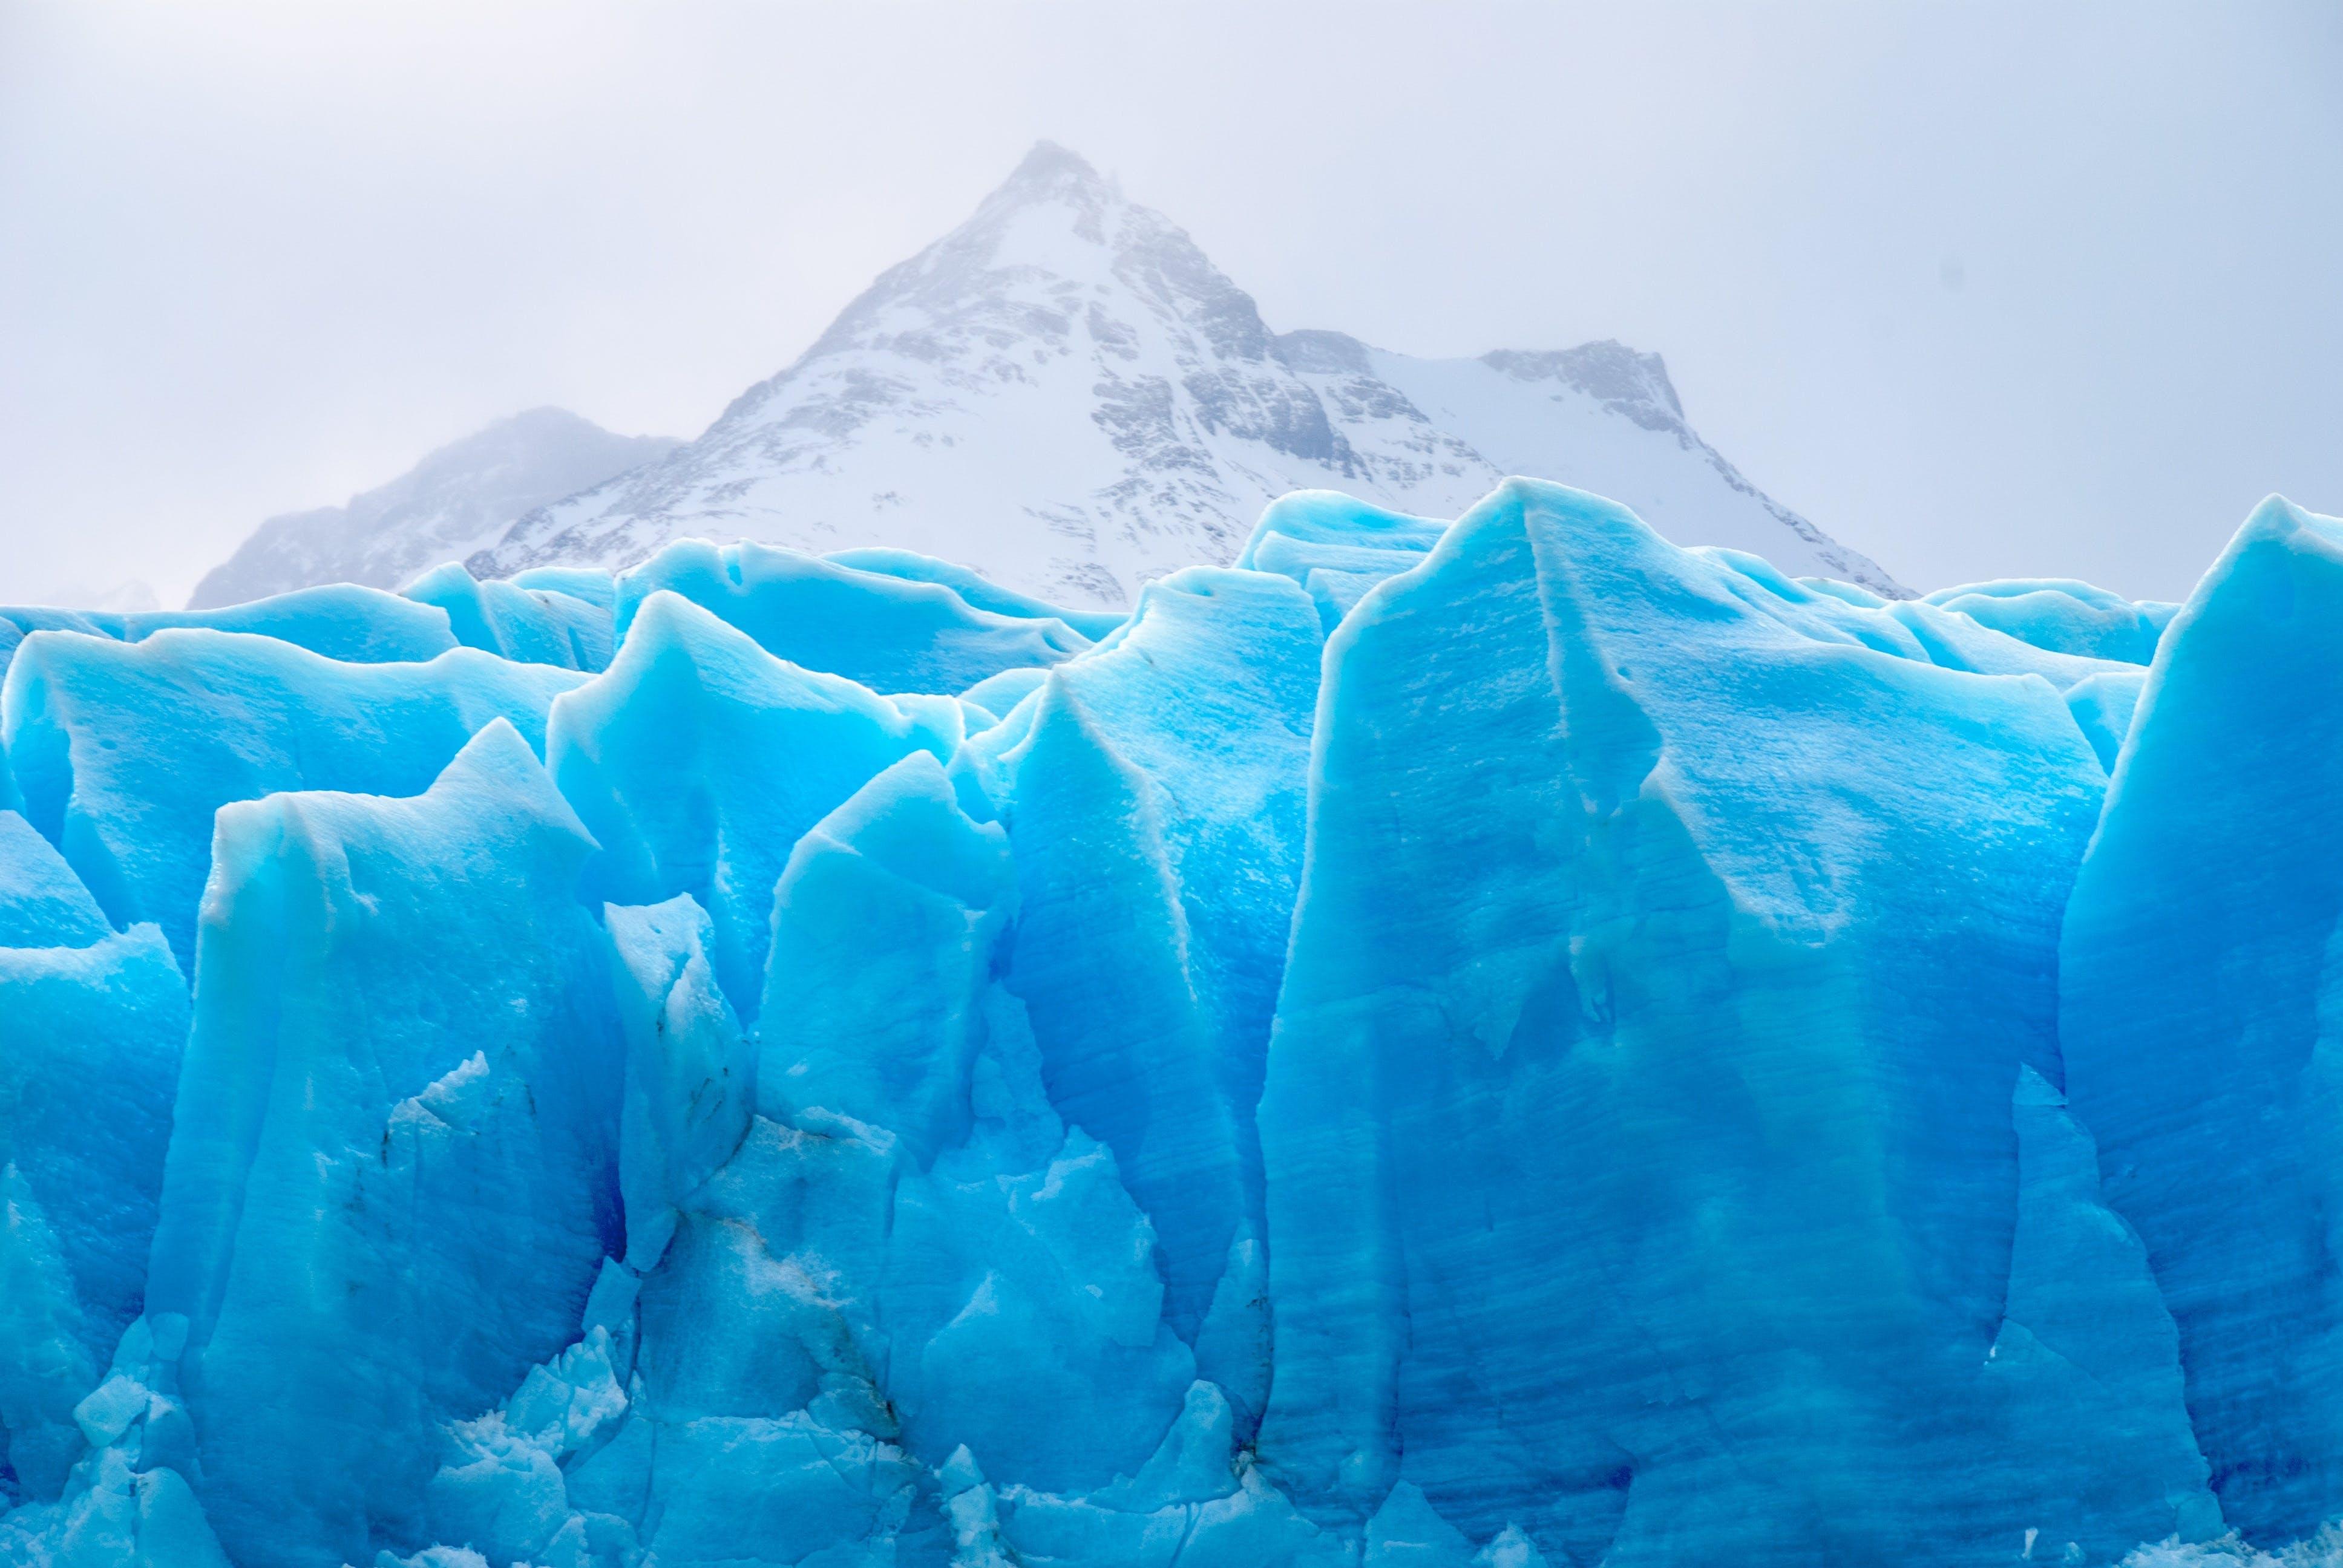 Blue Icebergs Under Cloudy Sky